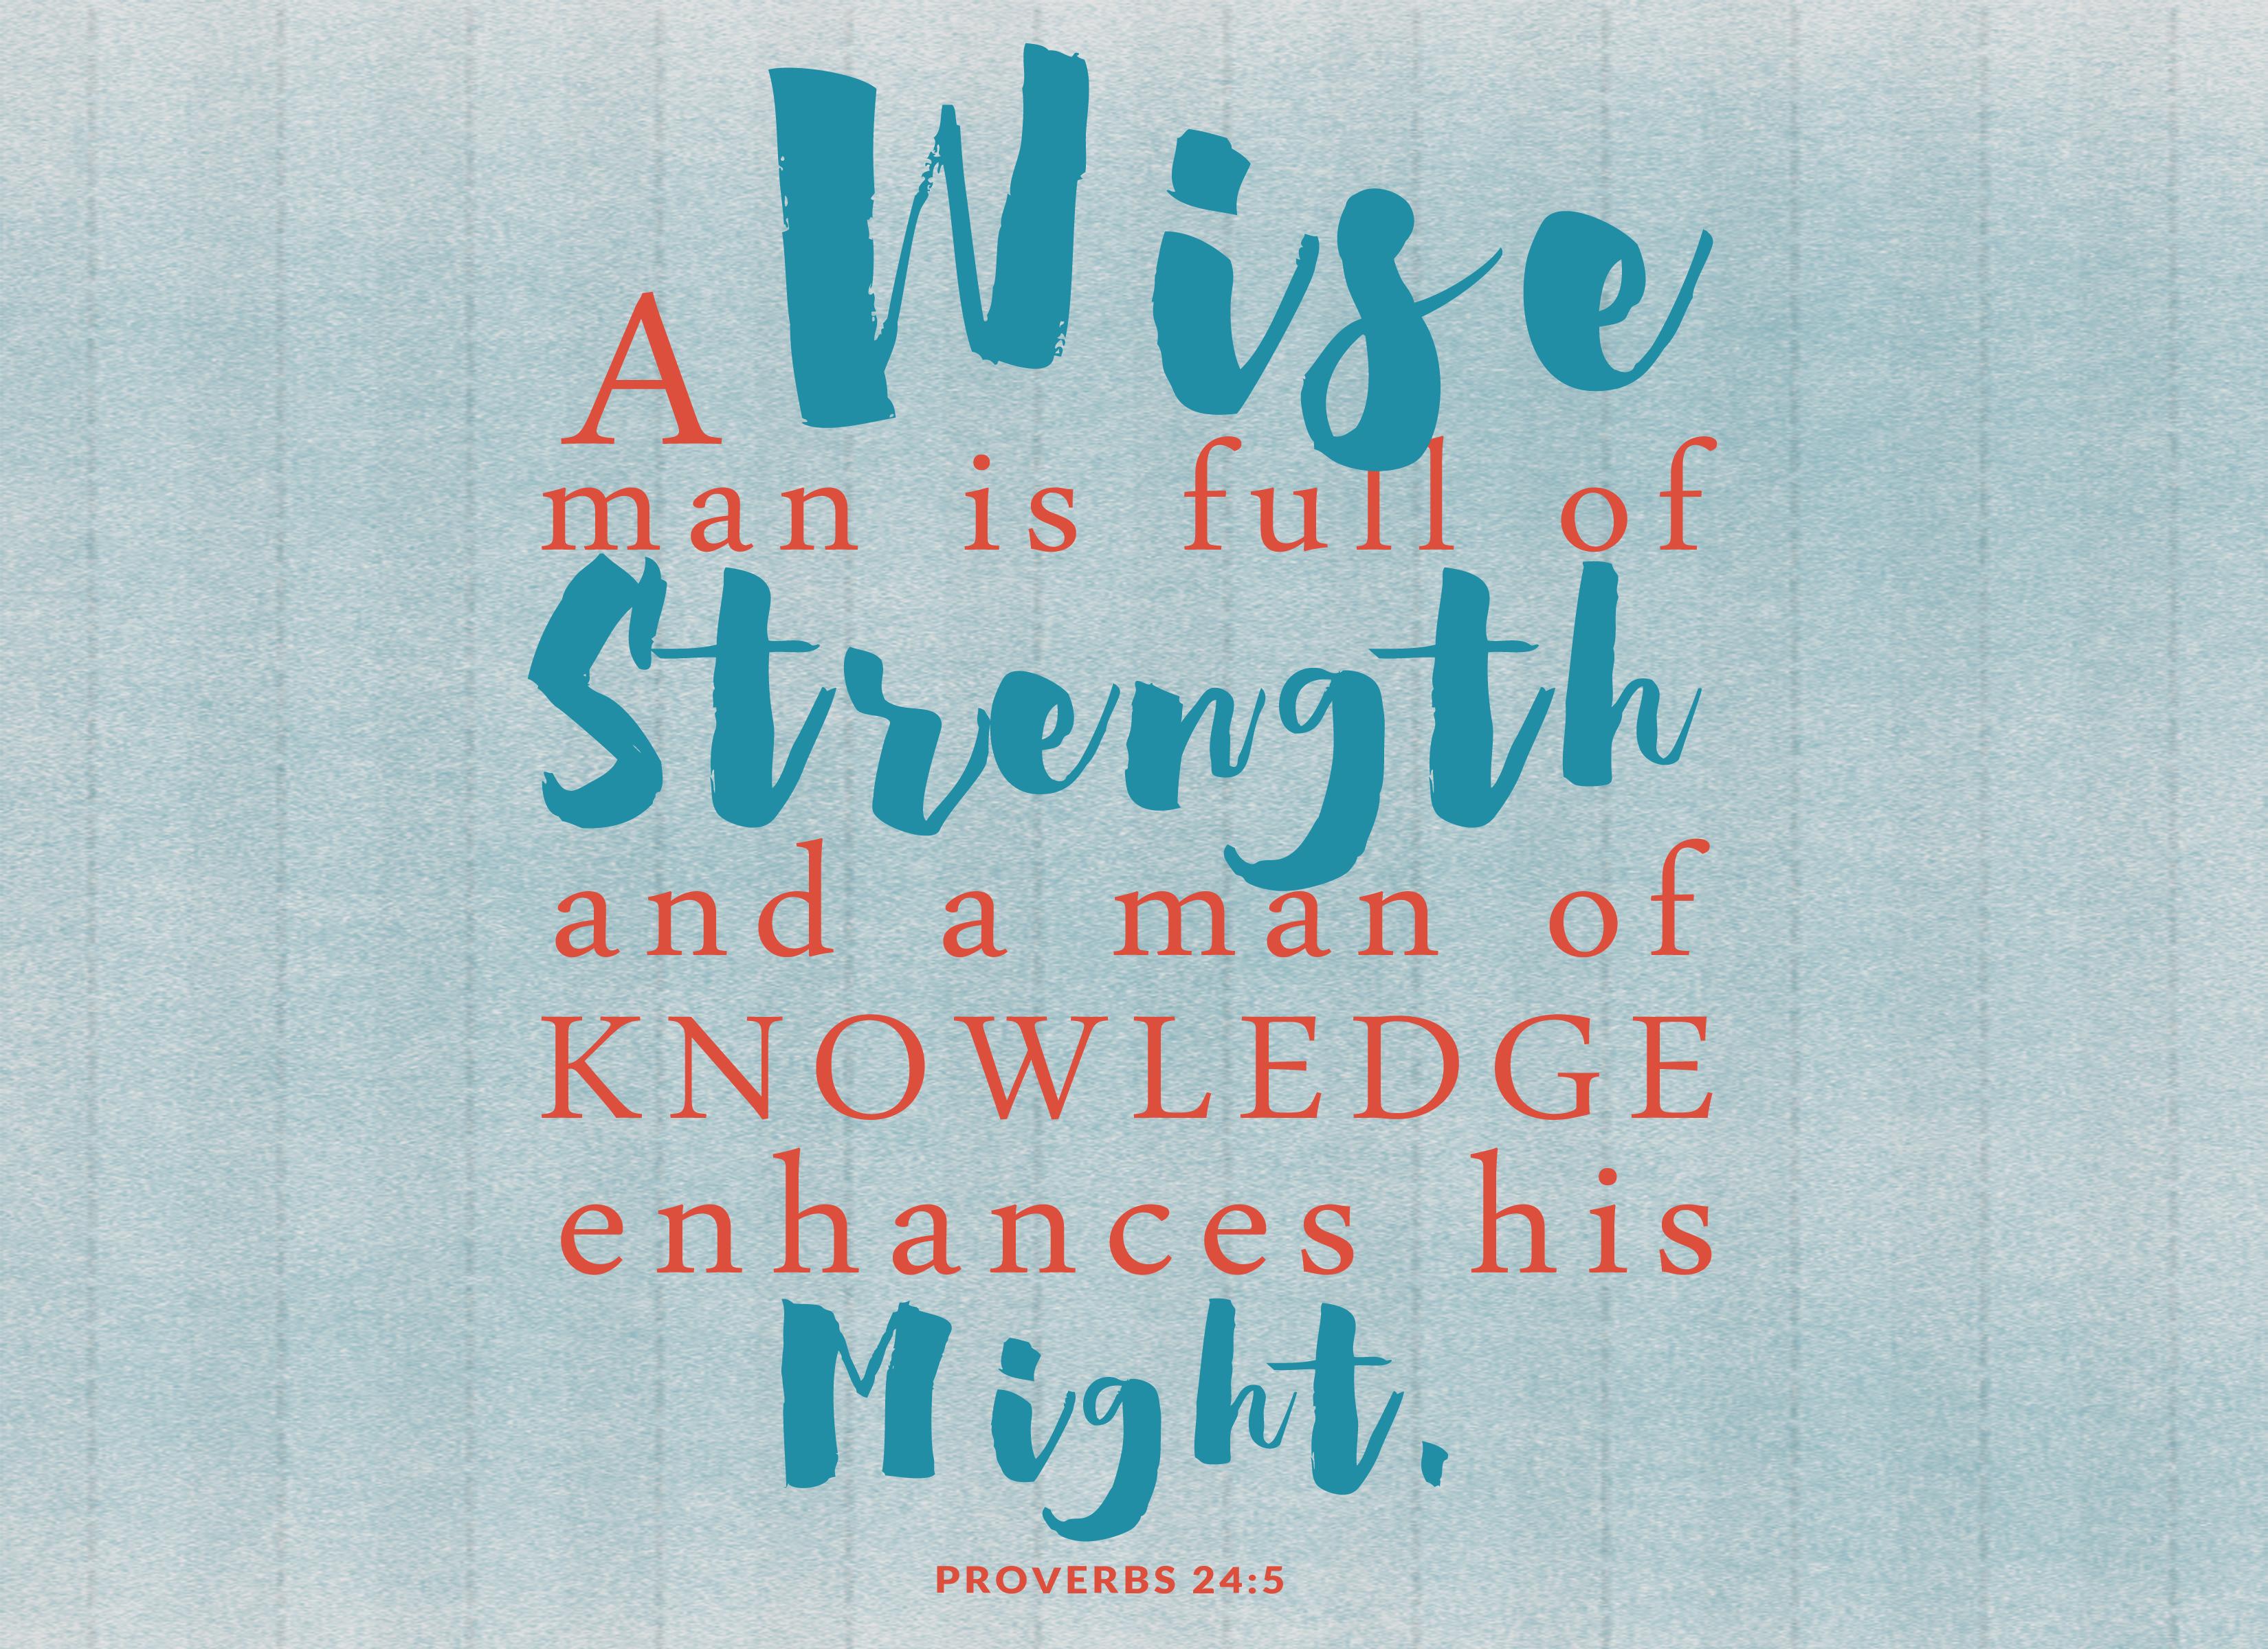 Knowledge VOW Printable